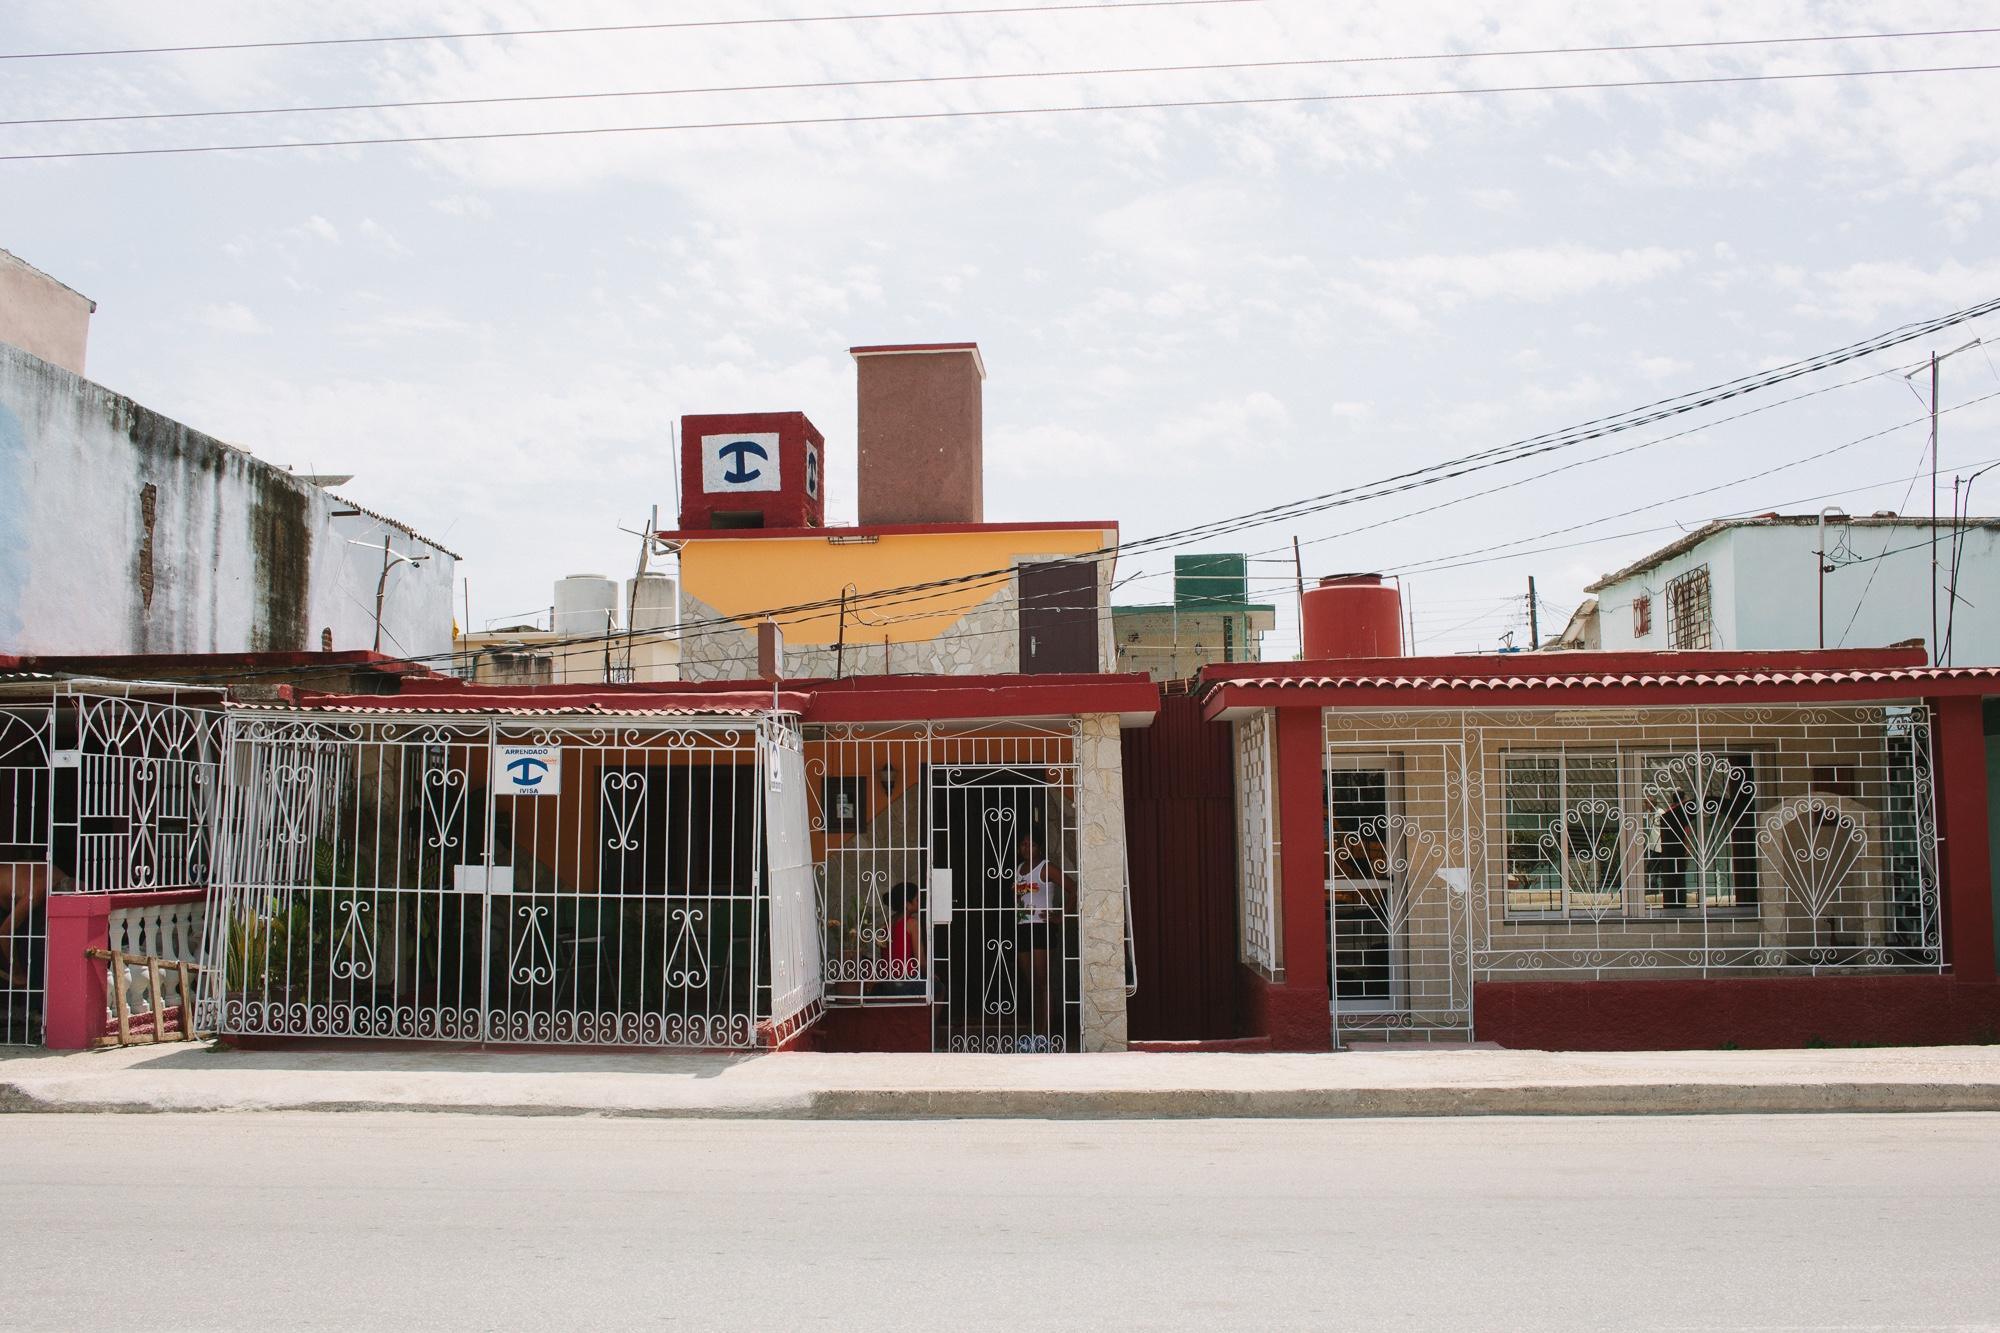 Zenaida's guesthouse